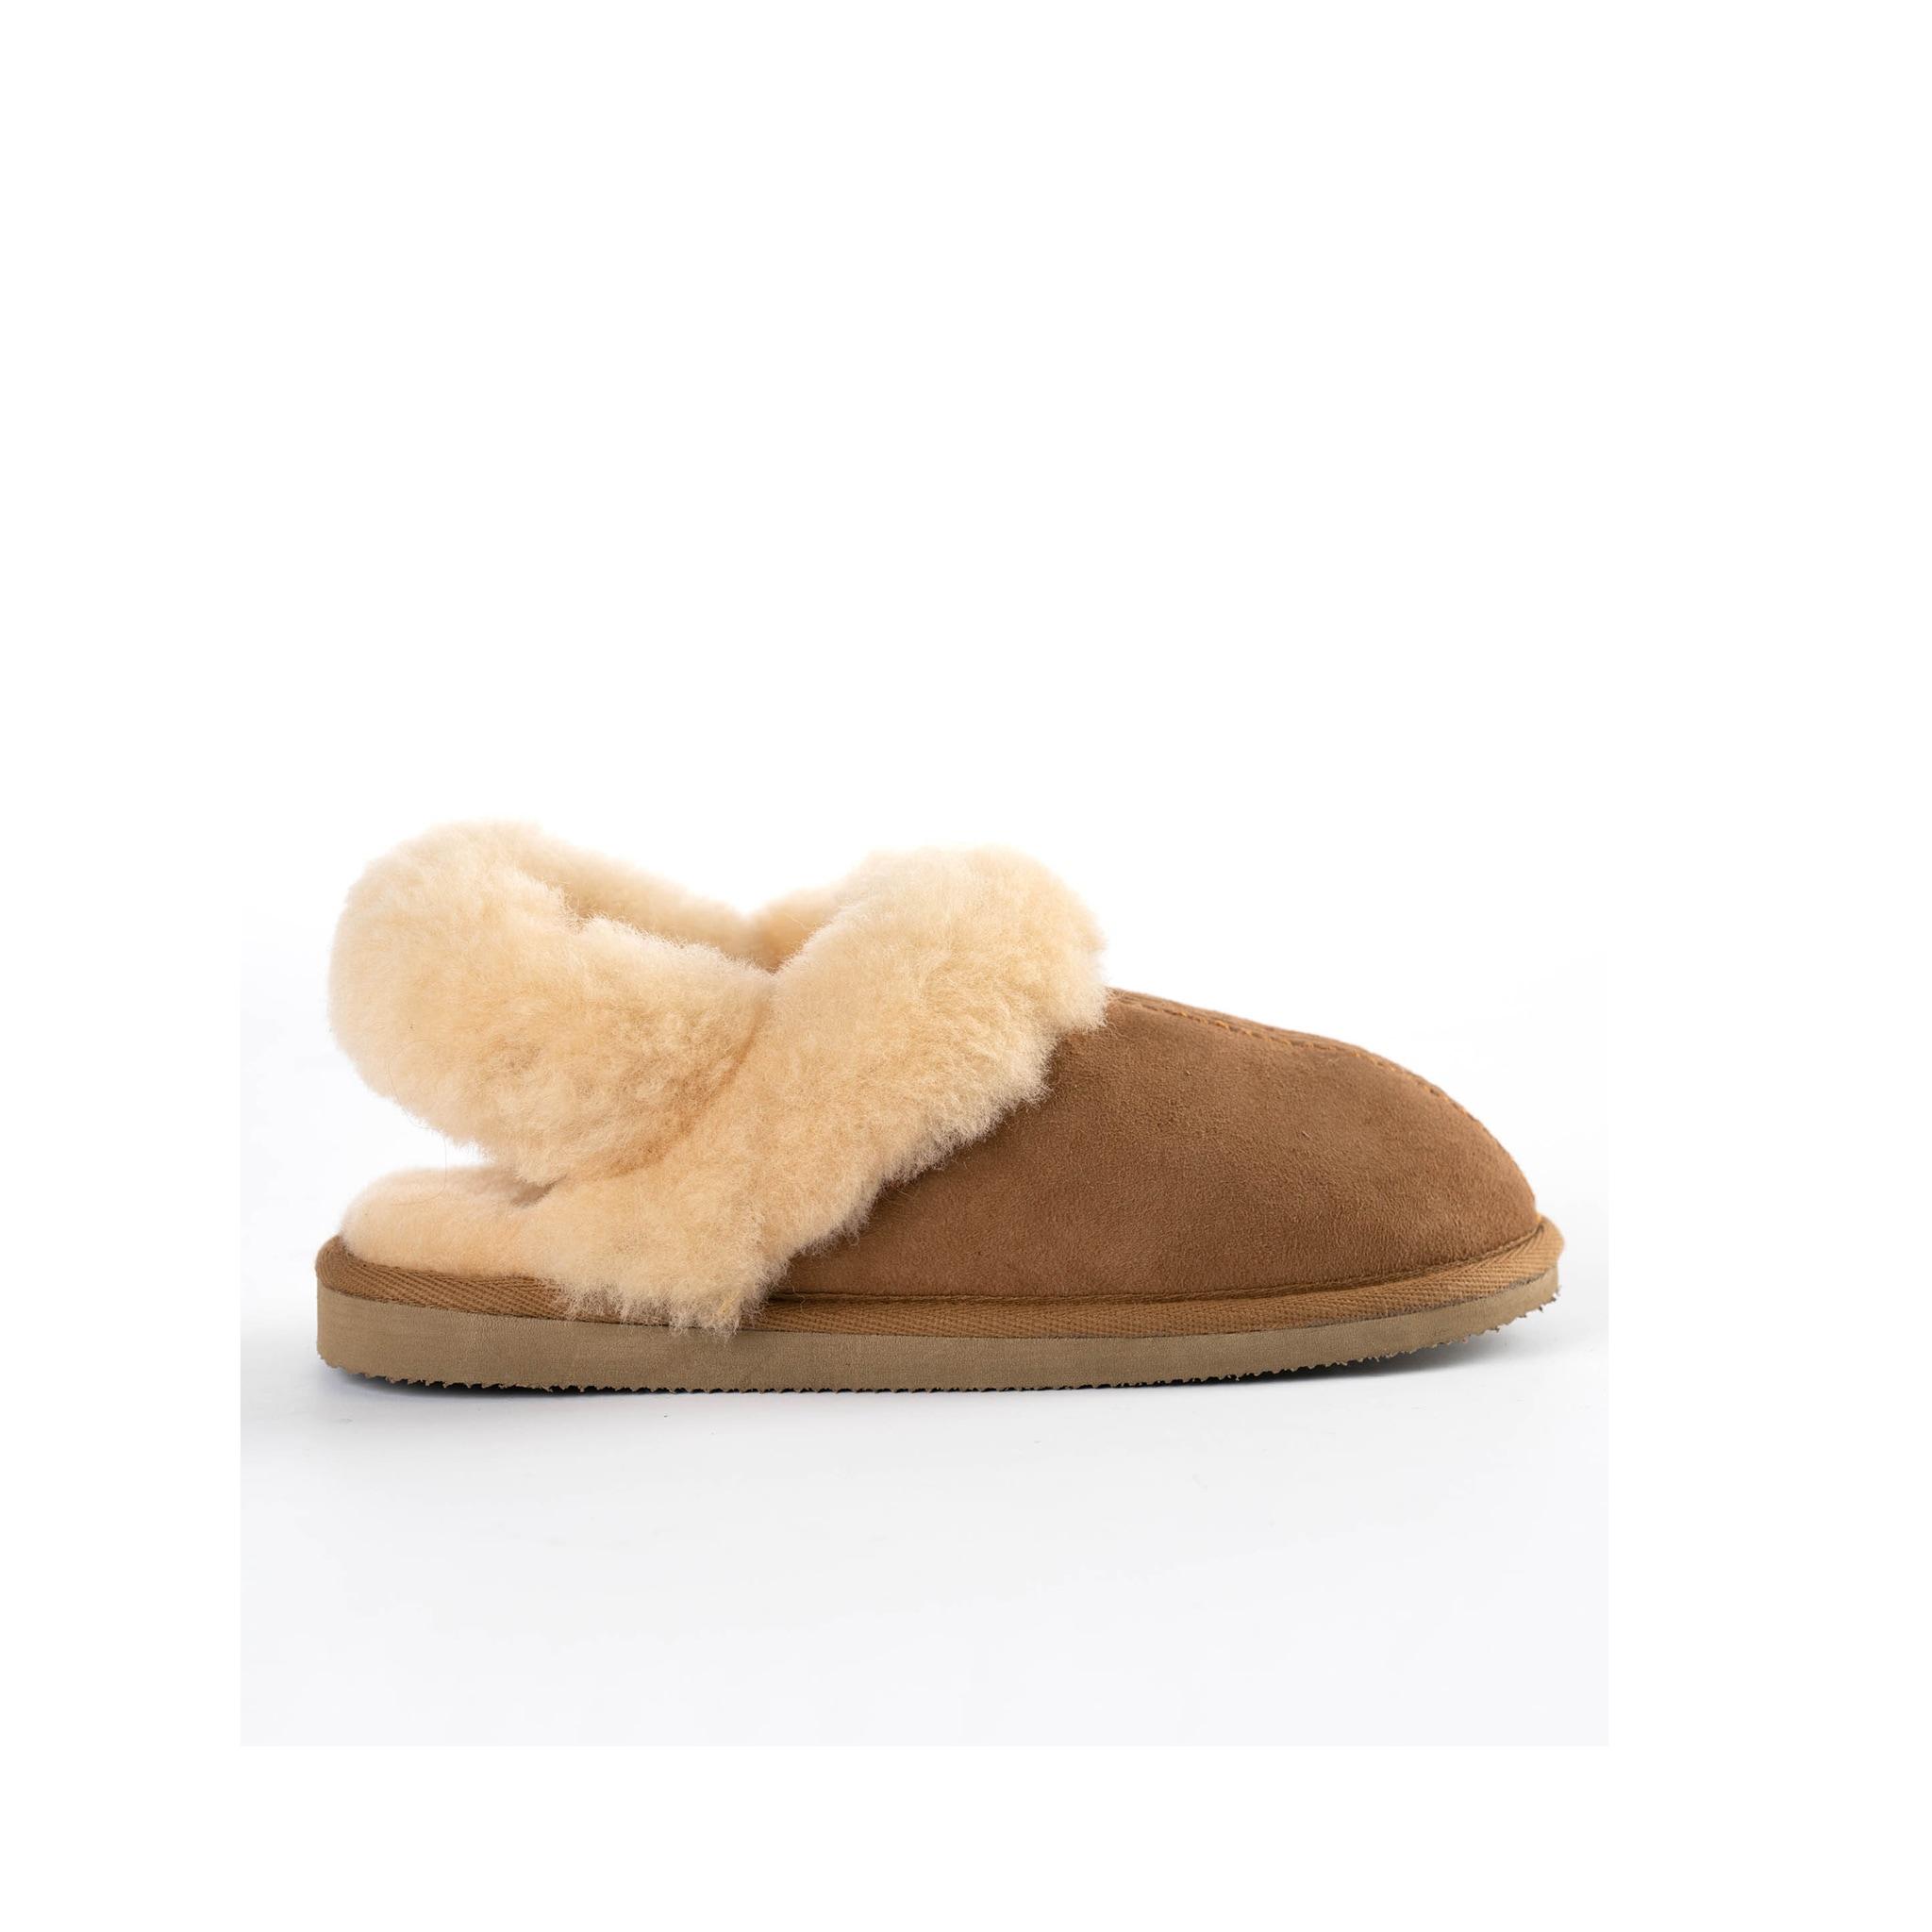 Edith sheepskin slippers